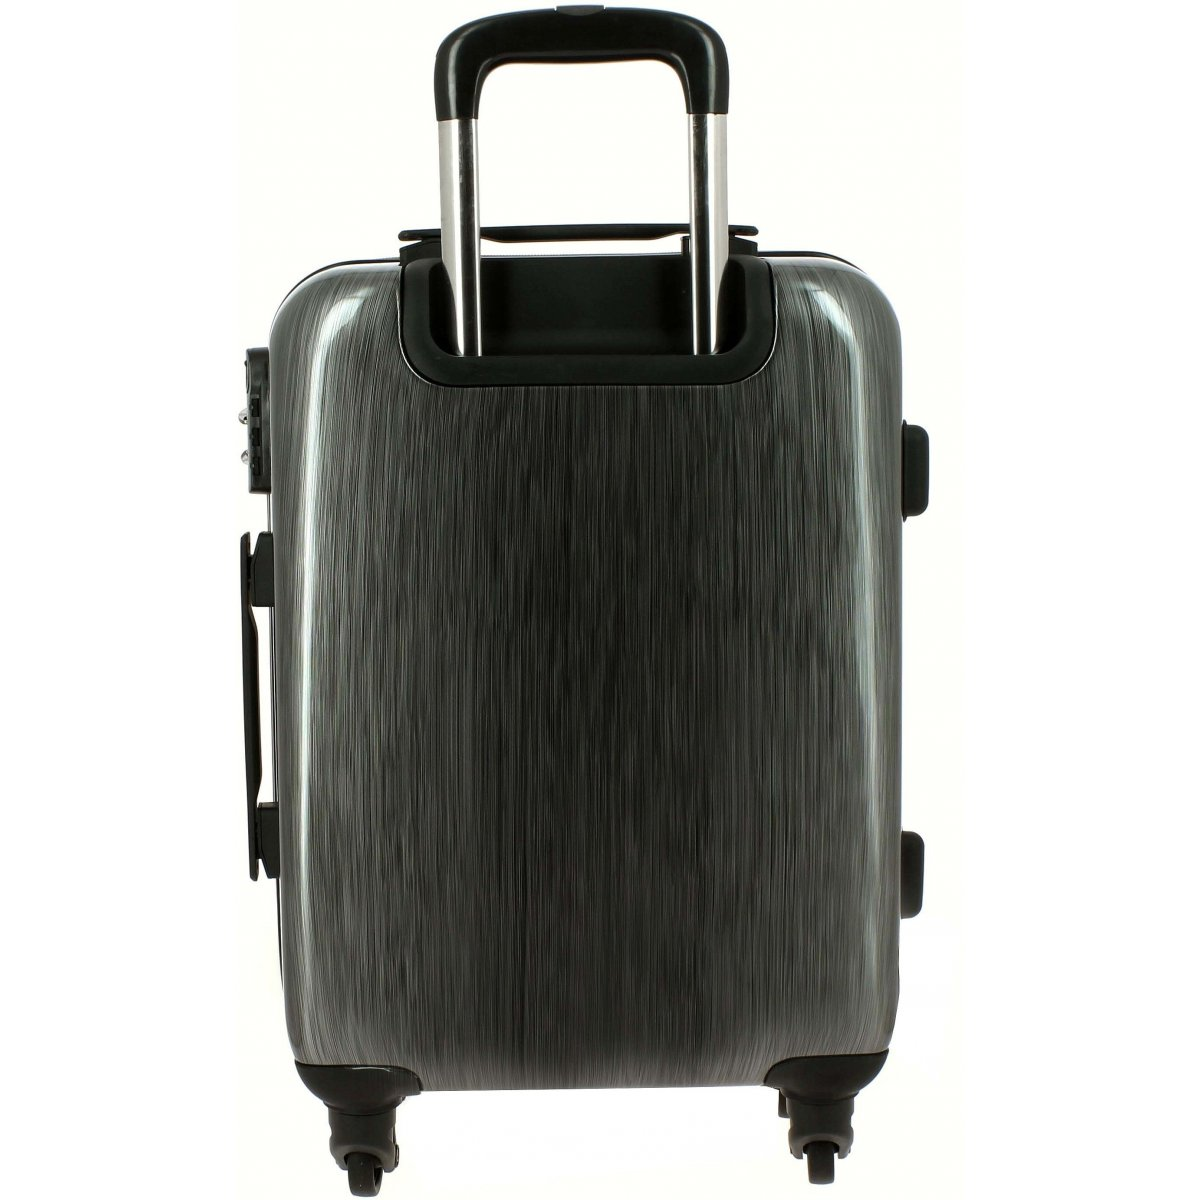 valise cabine ryanair david jones ba20591p couleur principale black fabric promotion. Black Bedroom Furniture Sets. Home Design Ideas